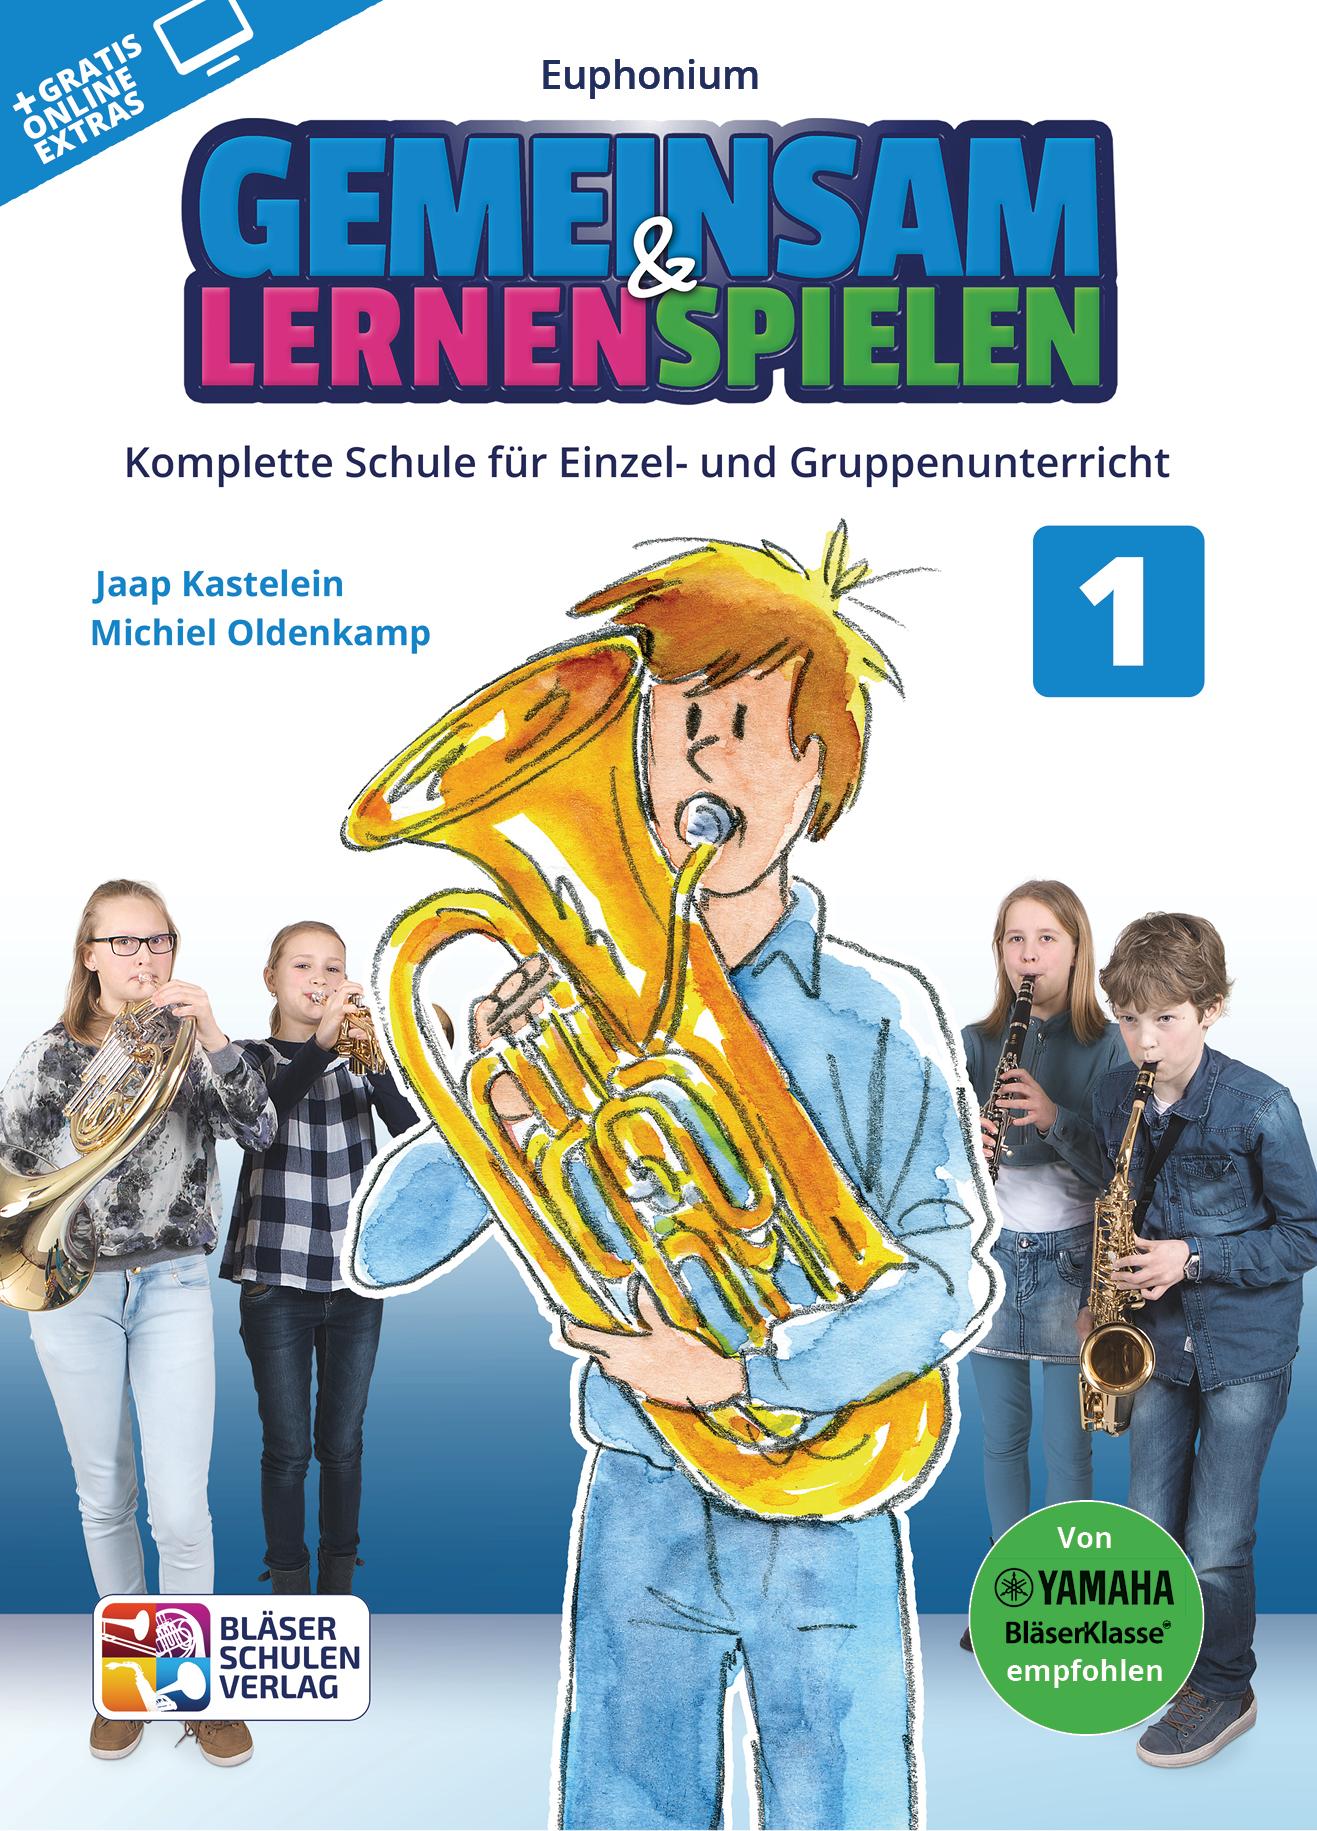 Gemeinsam Lernen & Spielen 1 Euphonium: Euphonium